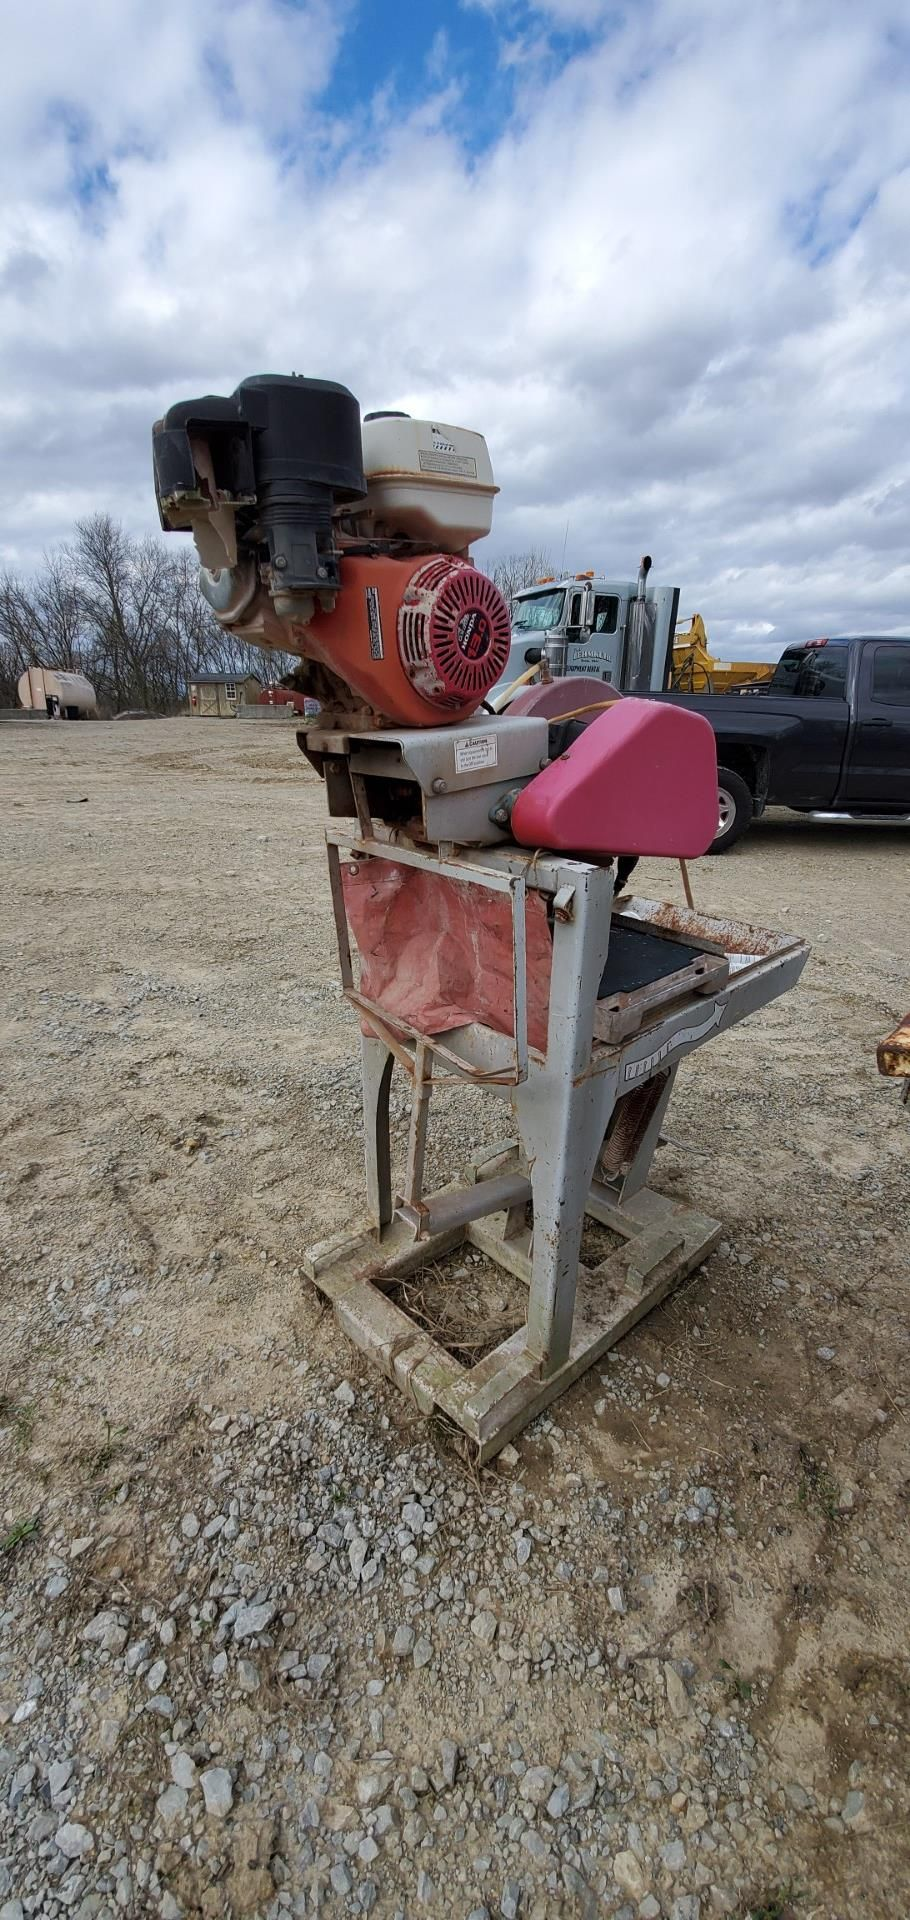 Stone Model MS2 20 in Masonry Block Saw, 13 HP Honda Gas Engine